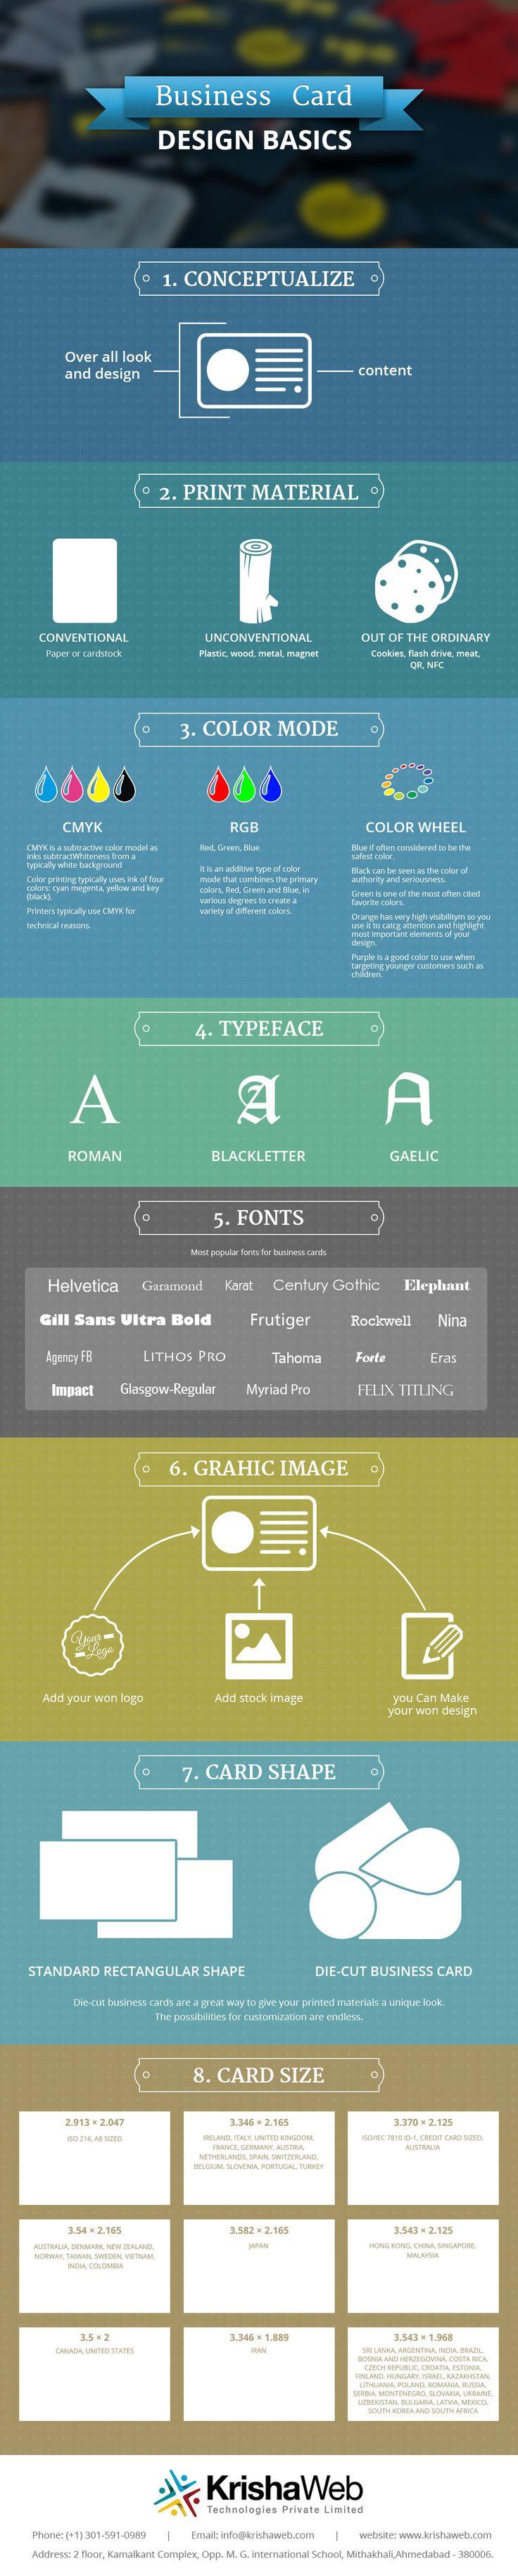 8090 best Business Card Design images on Pinterest